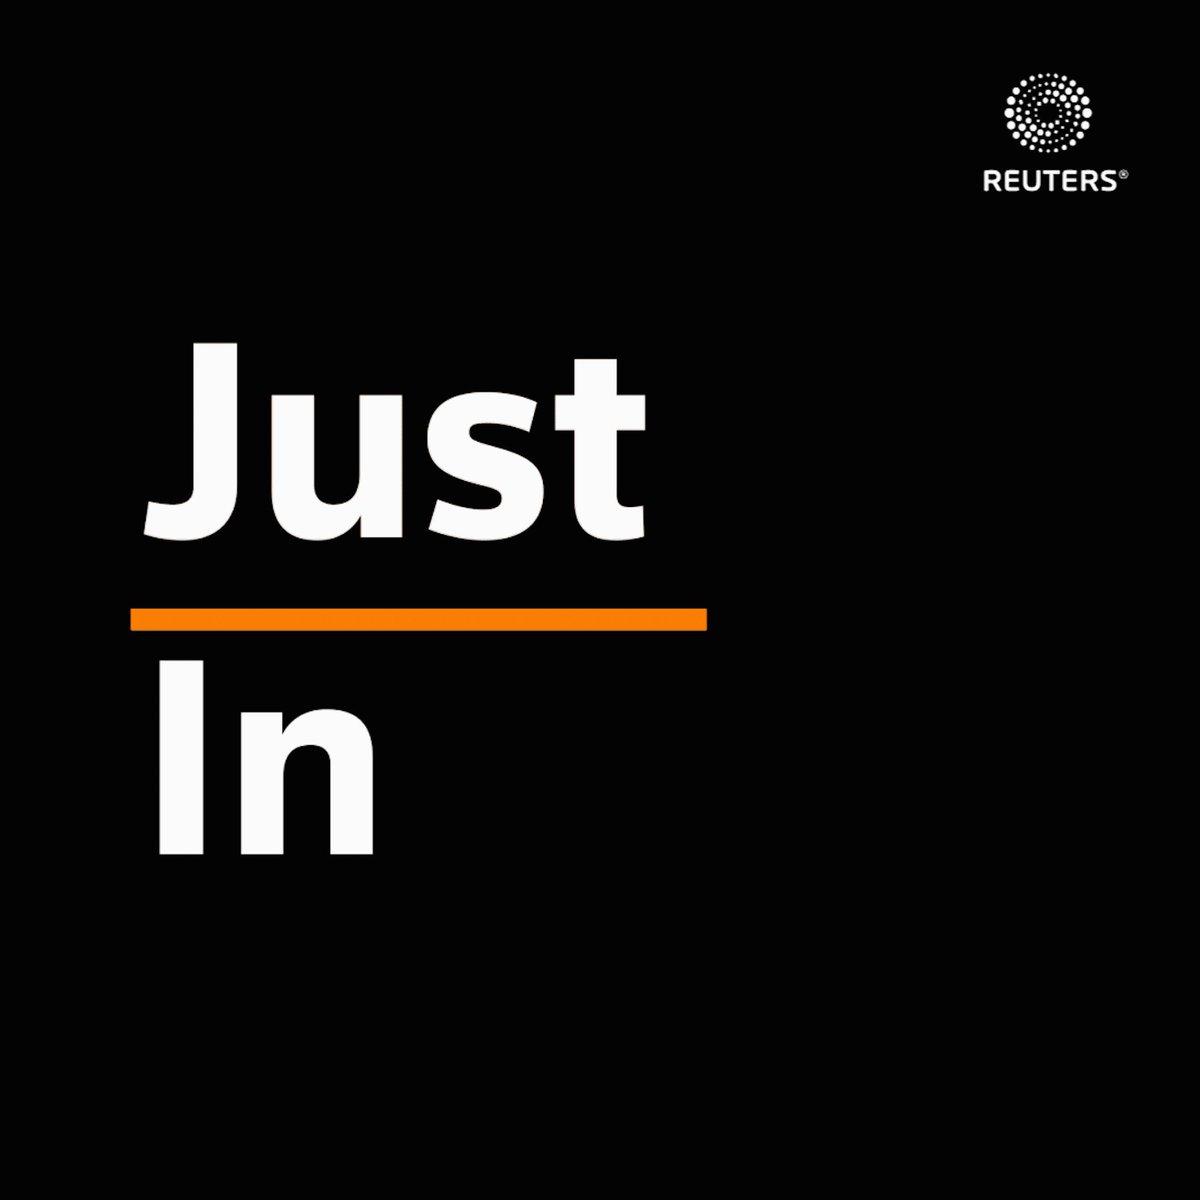 Senate passes $2 trillion coronavirus response bill unanimously. Live updates: https://t.co/NgGBOUftIM https://t.co/YeCcJ99l45